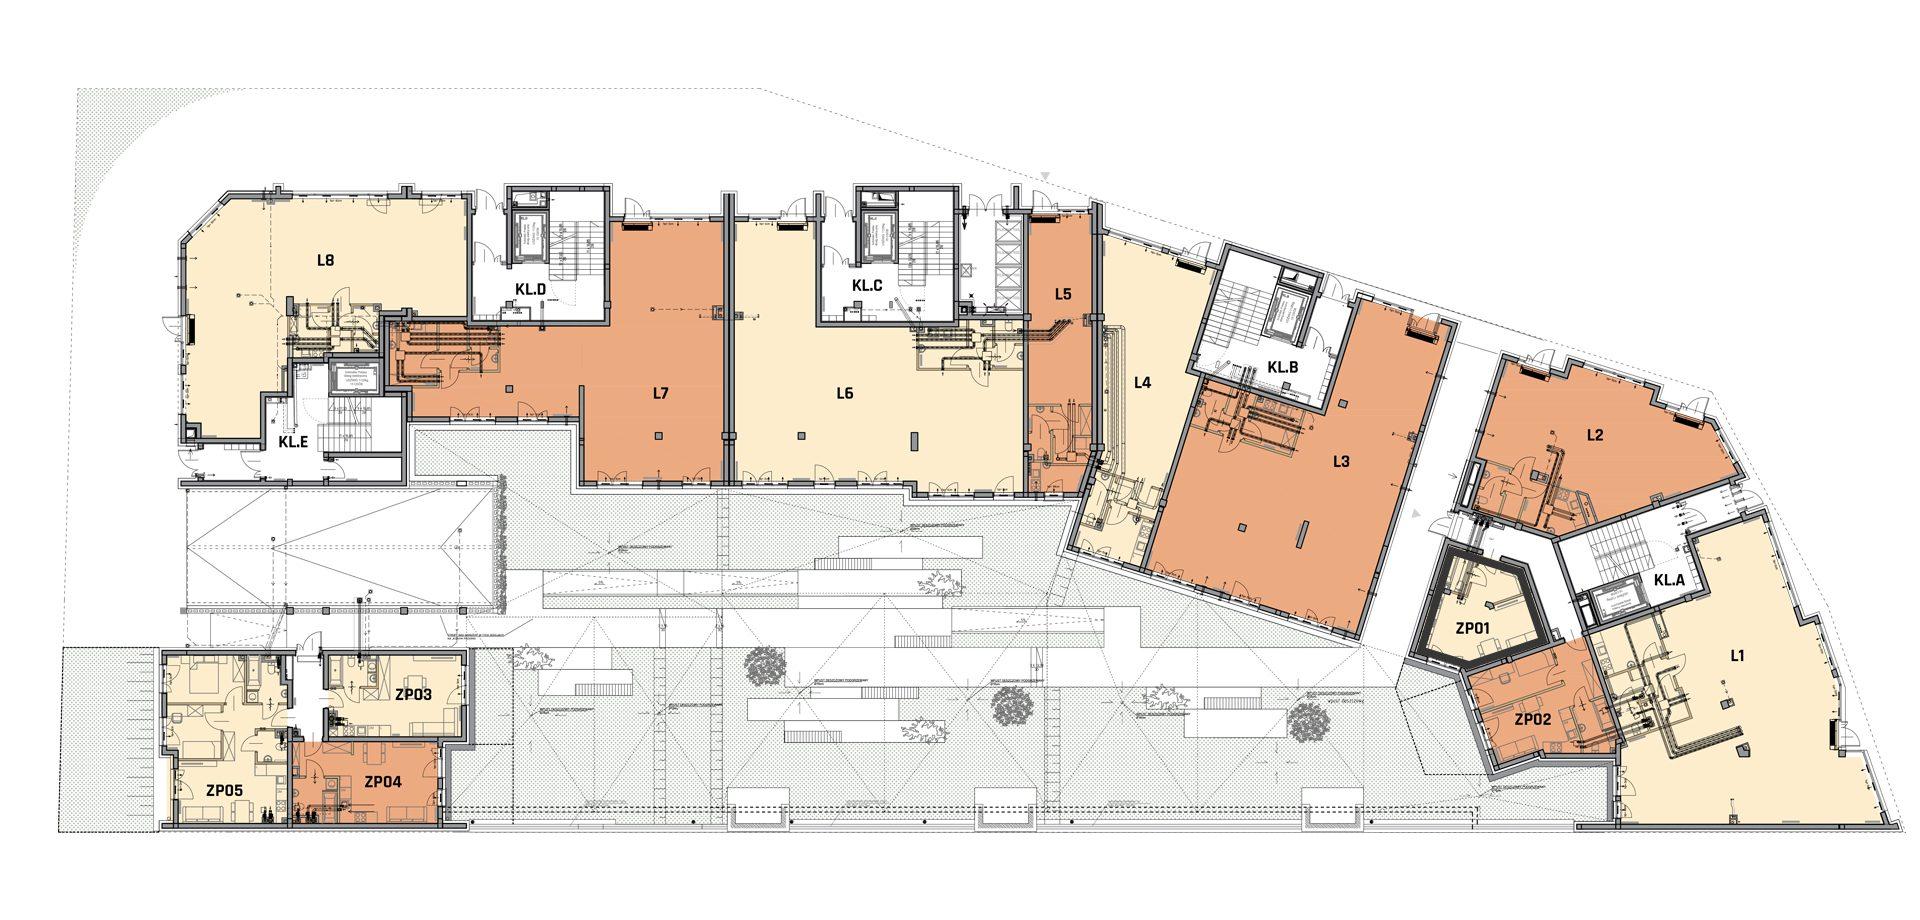 Nowe mieszkanie Kielce   Hill Bud Nova Klonova